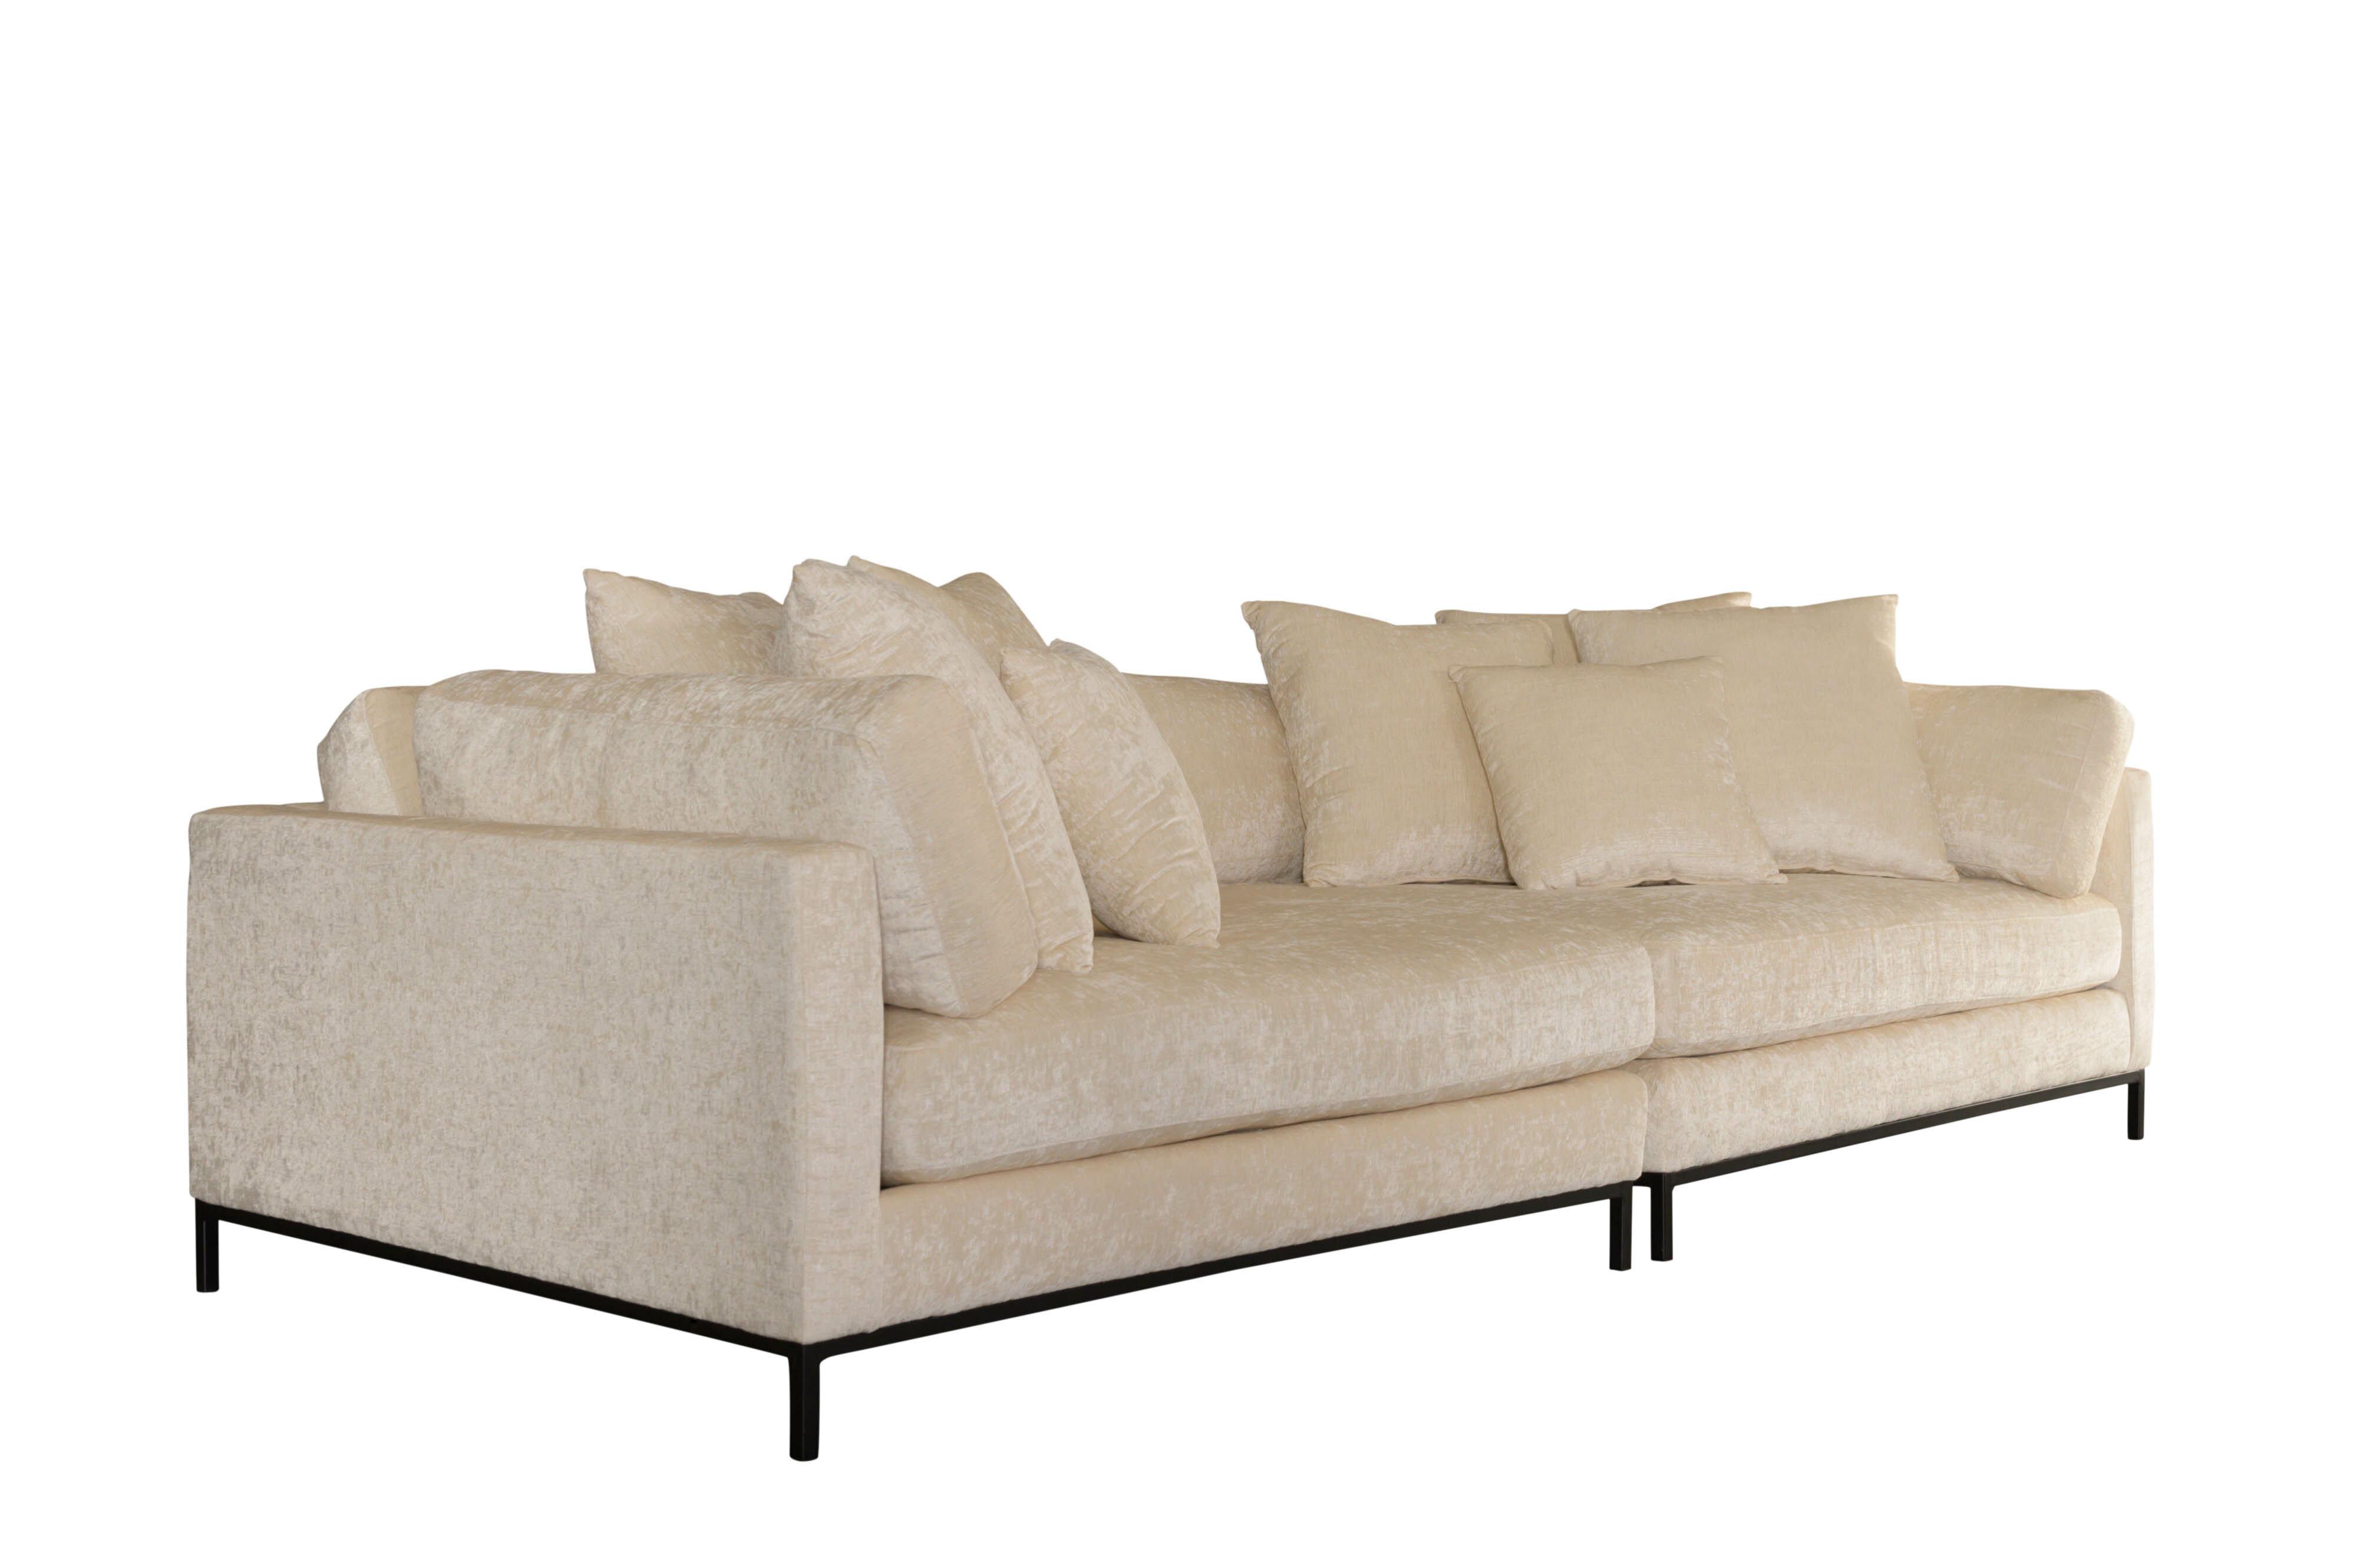 Pleasant Home By Sean Catherine Lowe Veda Sofa Reviews Wayfair Machost Co Dining Chair Design Ideas Machostcouk